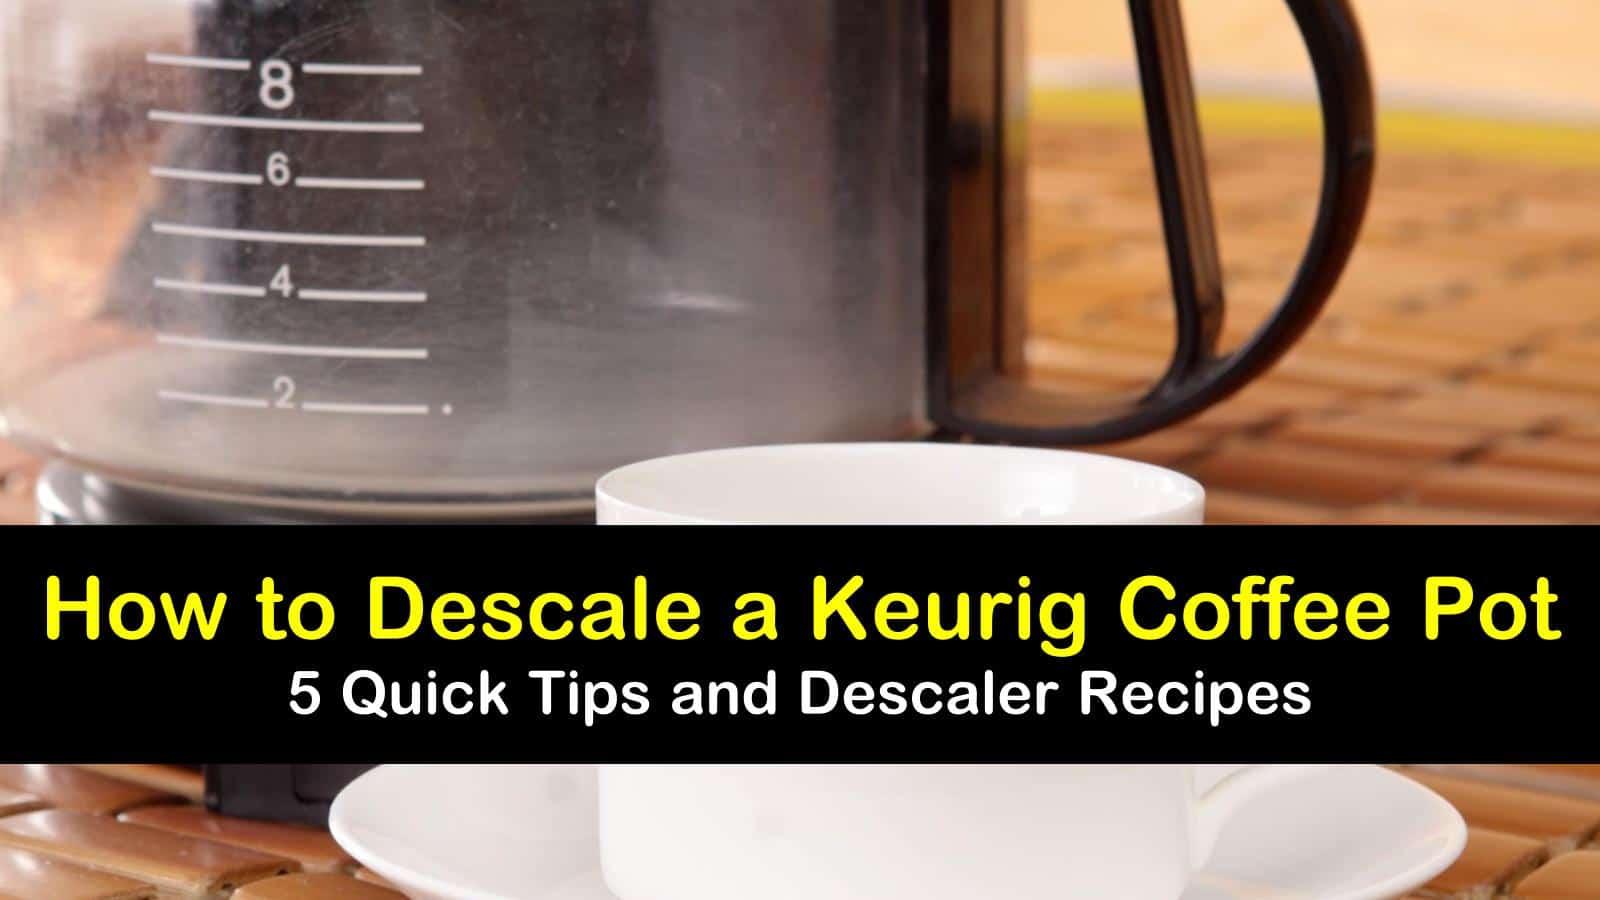 how to descale a keurig coffee pot titleimg1